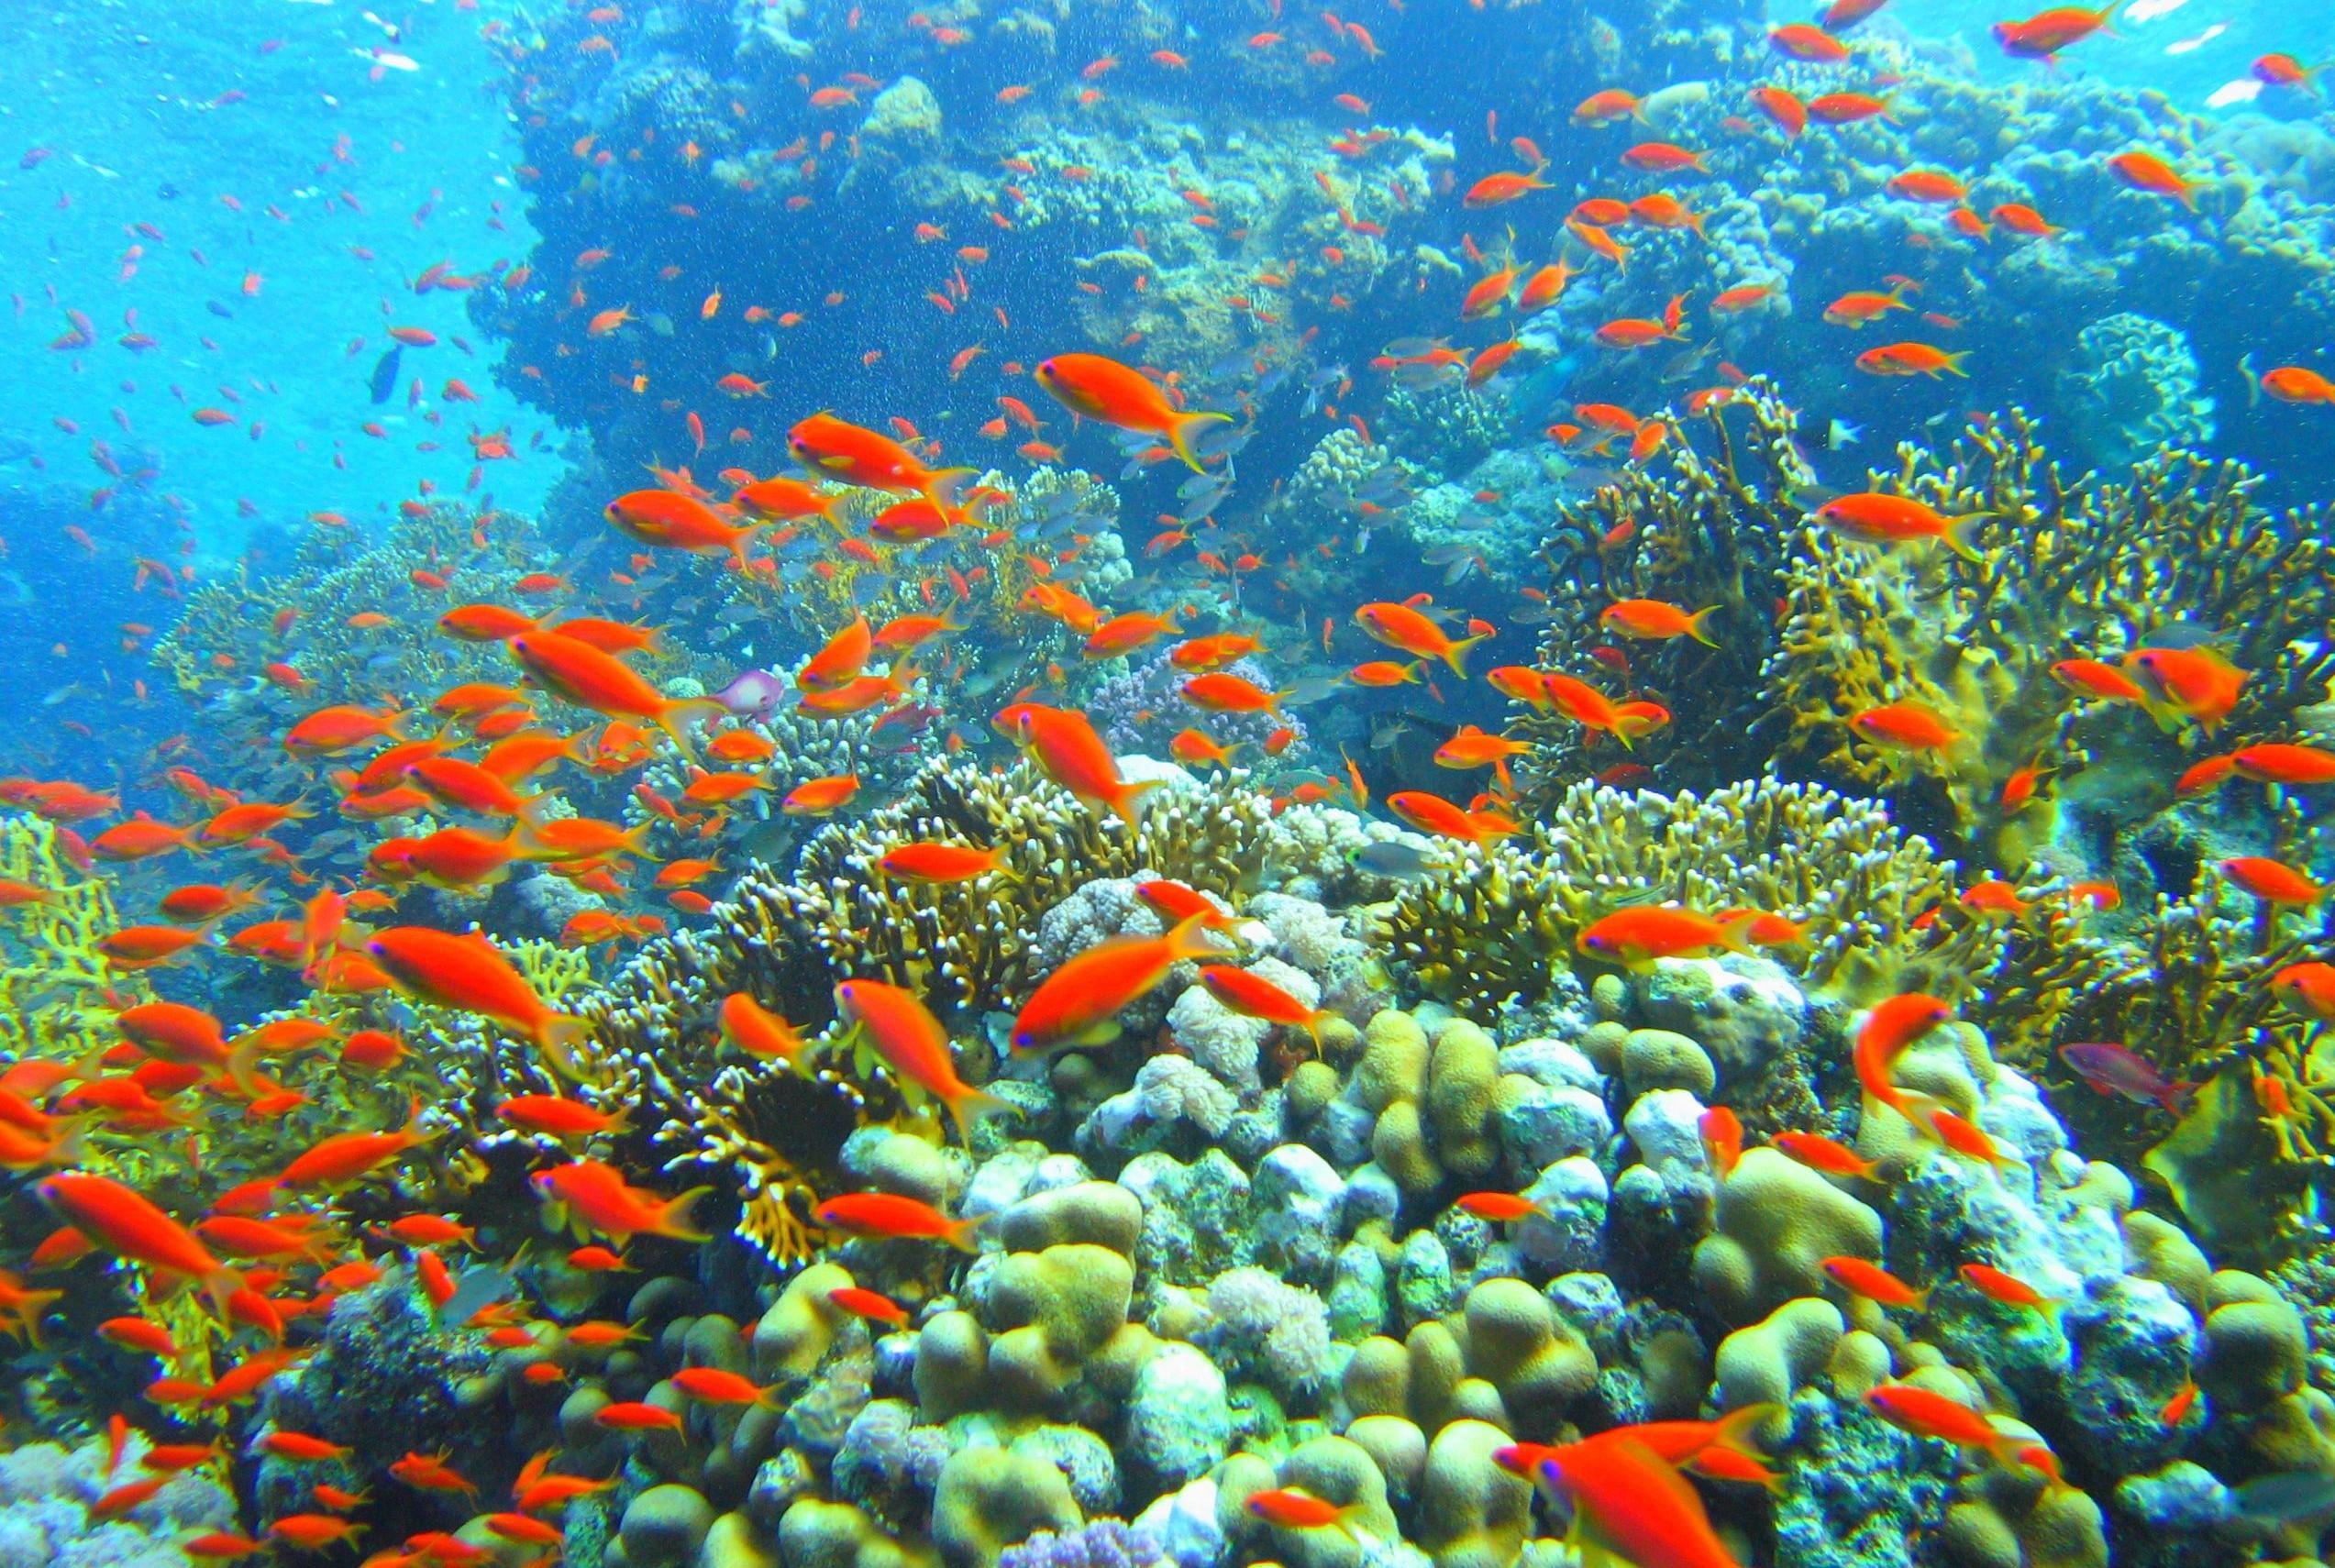 Coral_reef_in_Ras_Muhammad_nature_park_Iolanda_reef